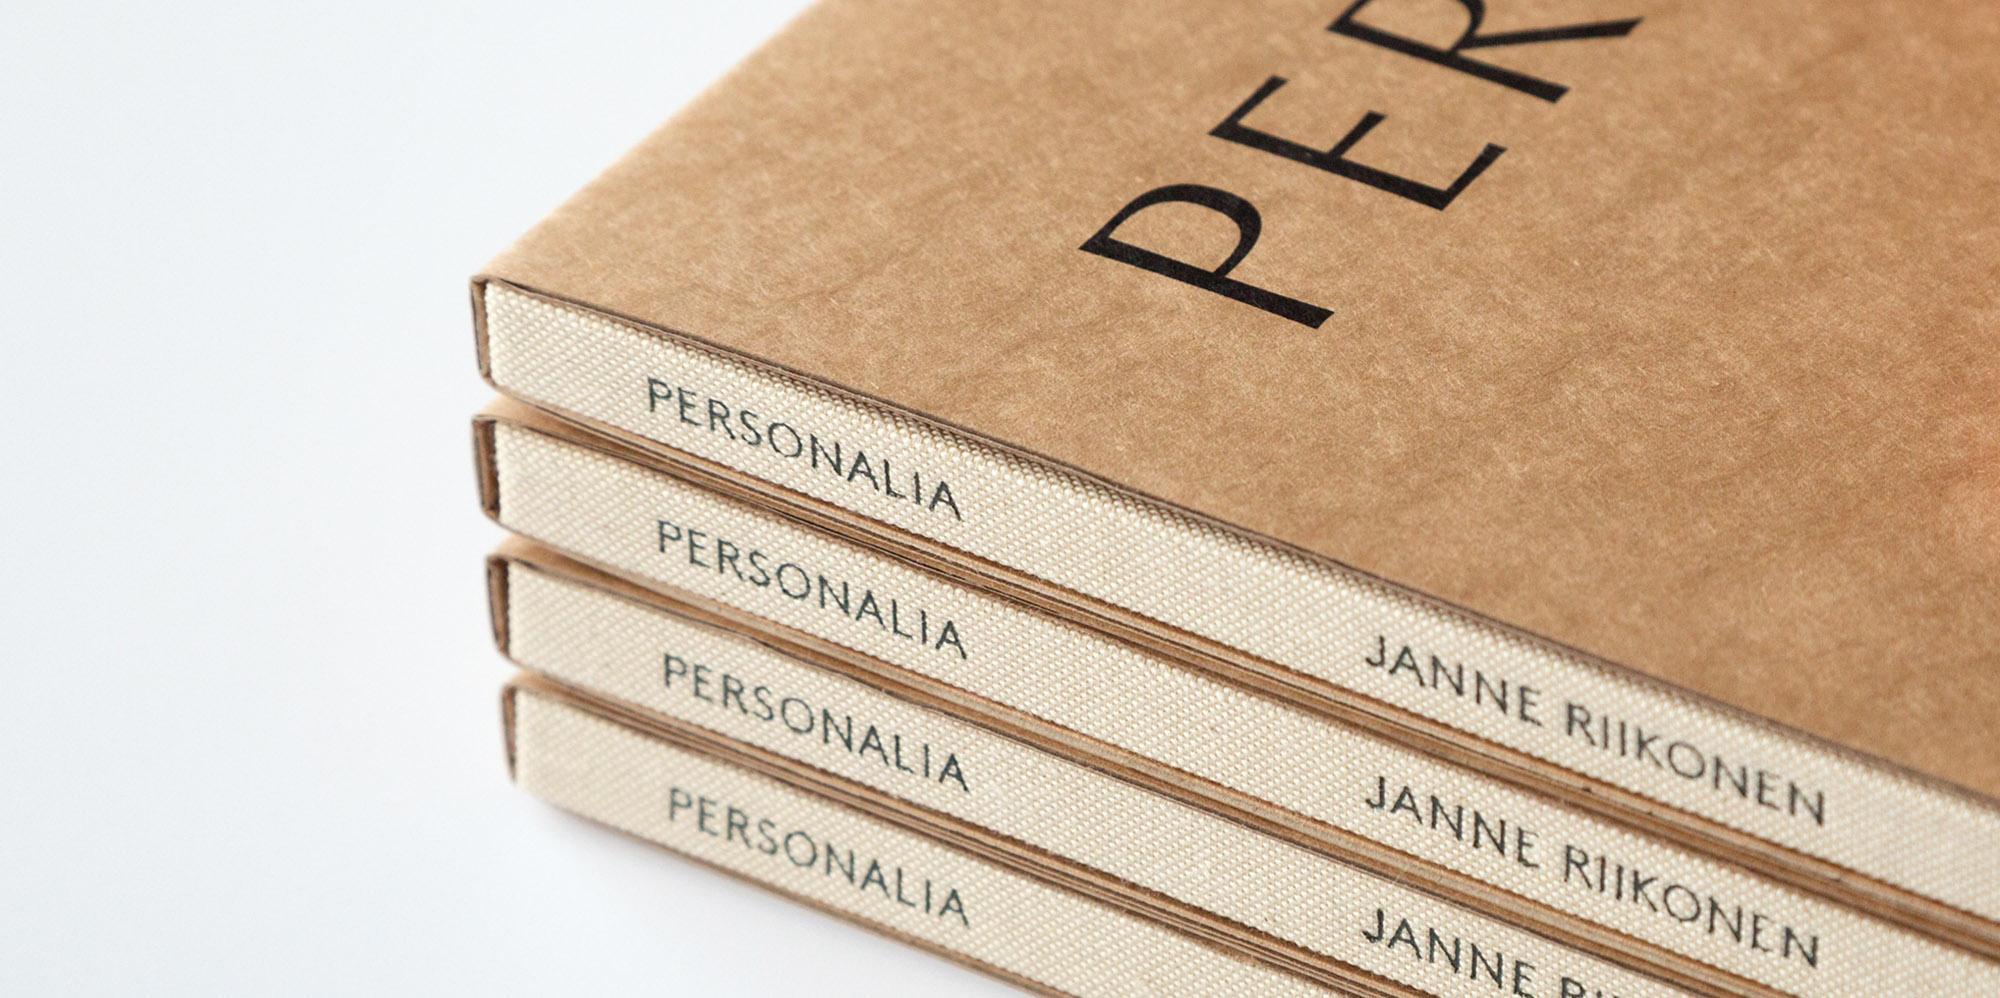 Personalia_JanneRiikonen_kultbooks_012.jpg